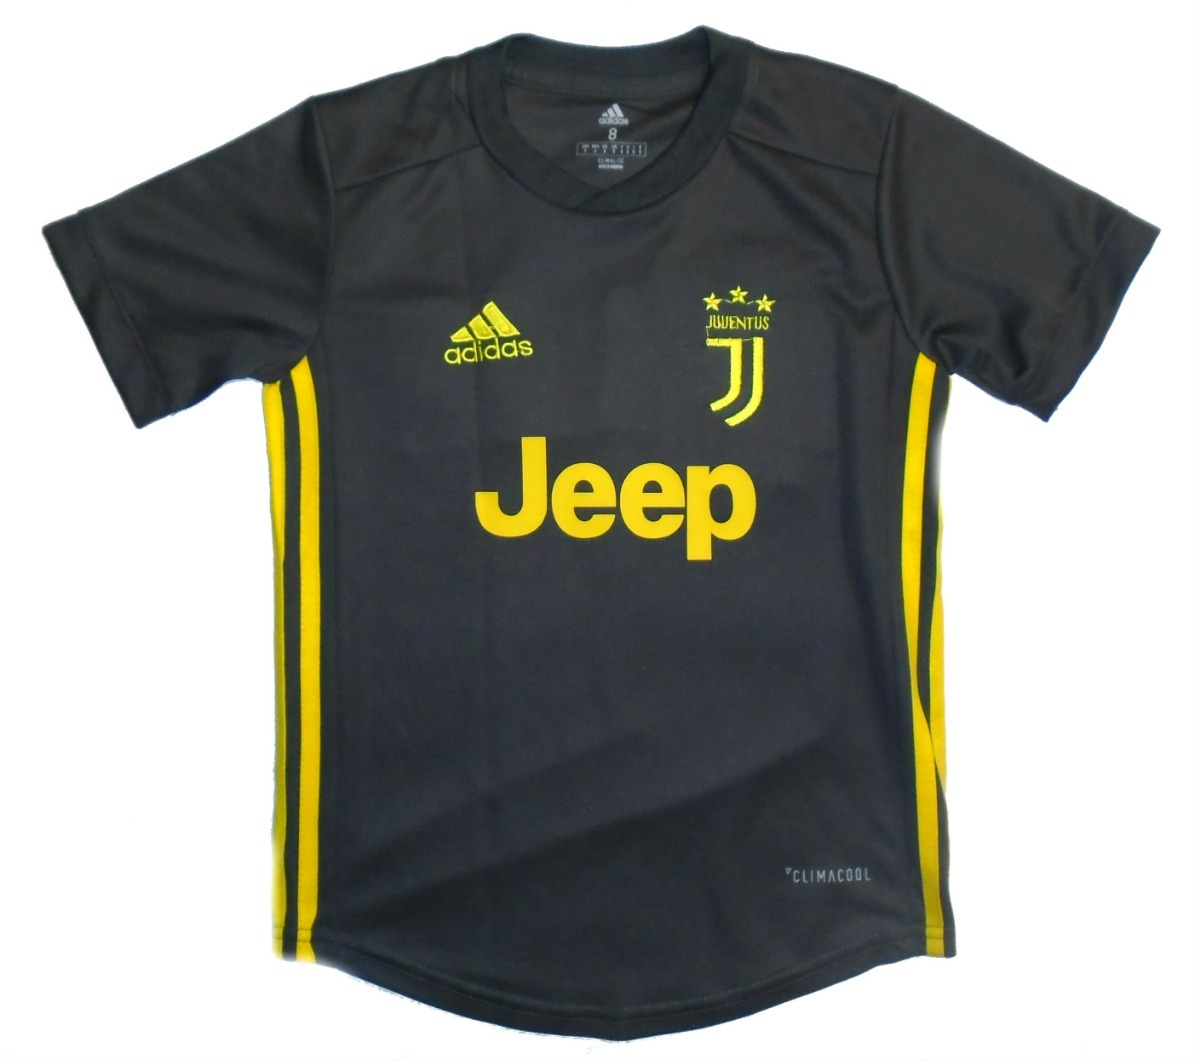 54fdef602e Camiseta alternativa de juventus ronaldo niño cargando zoom jpg 1200x1061  2019 juventus playera niño escudos para